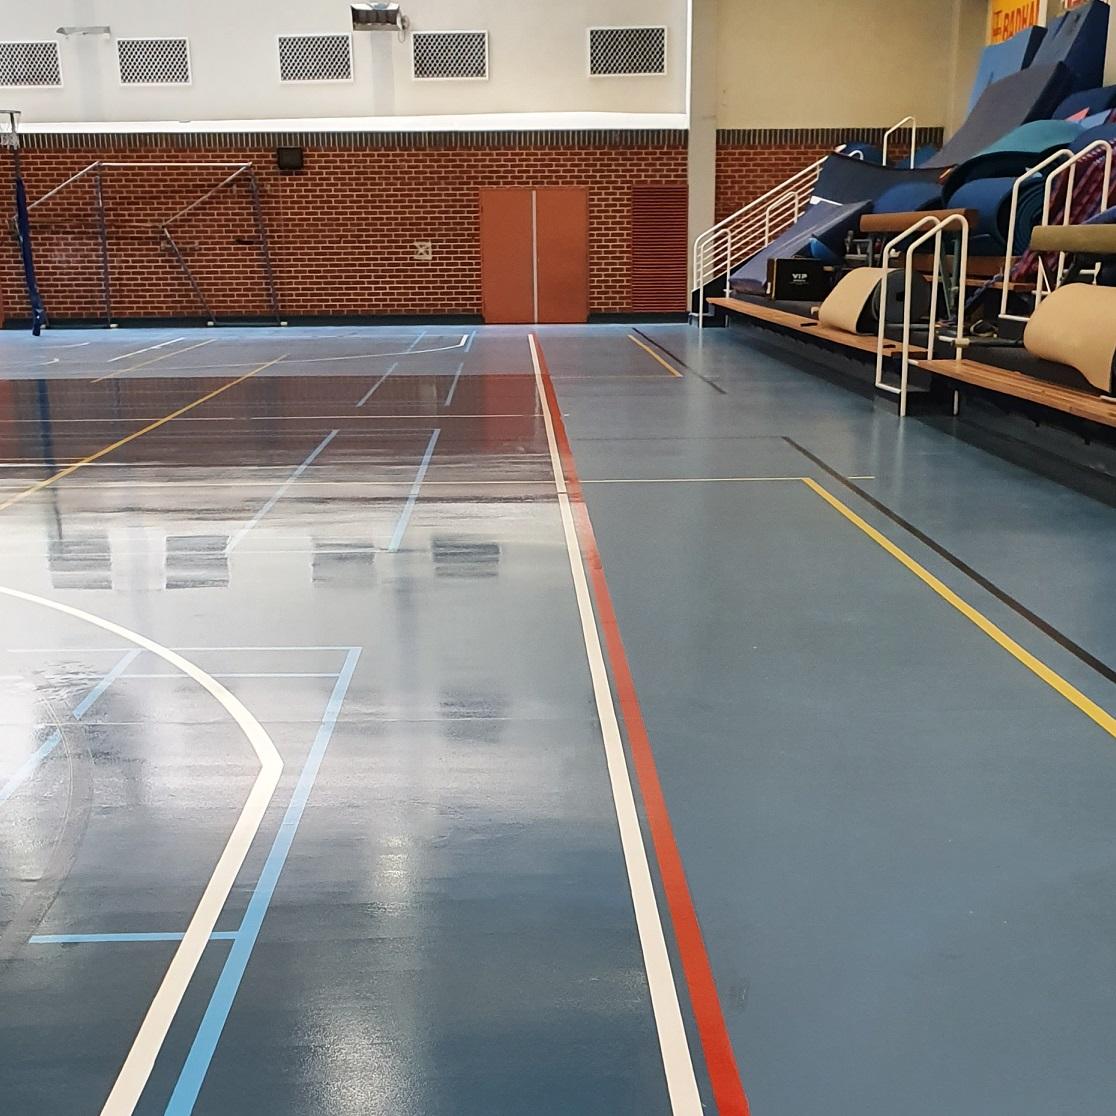 SCEGGS School Synthetic Basketball Court – 5